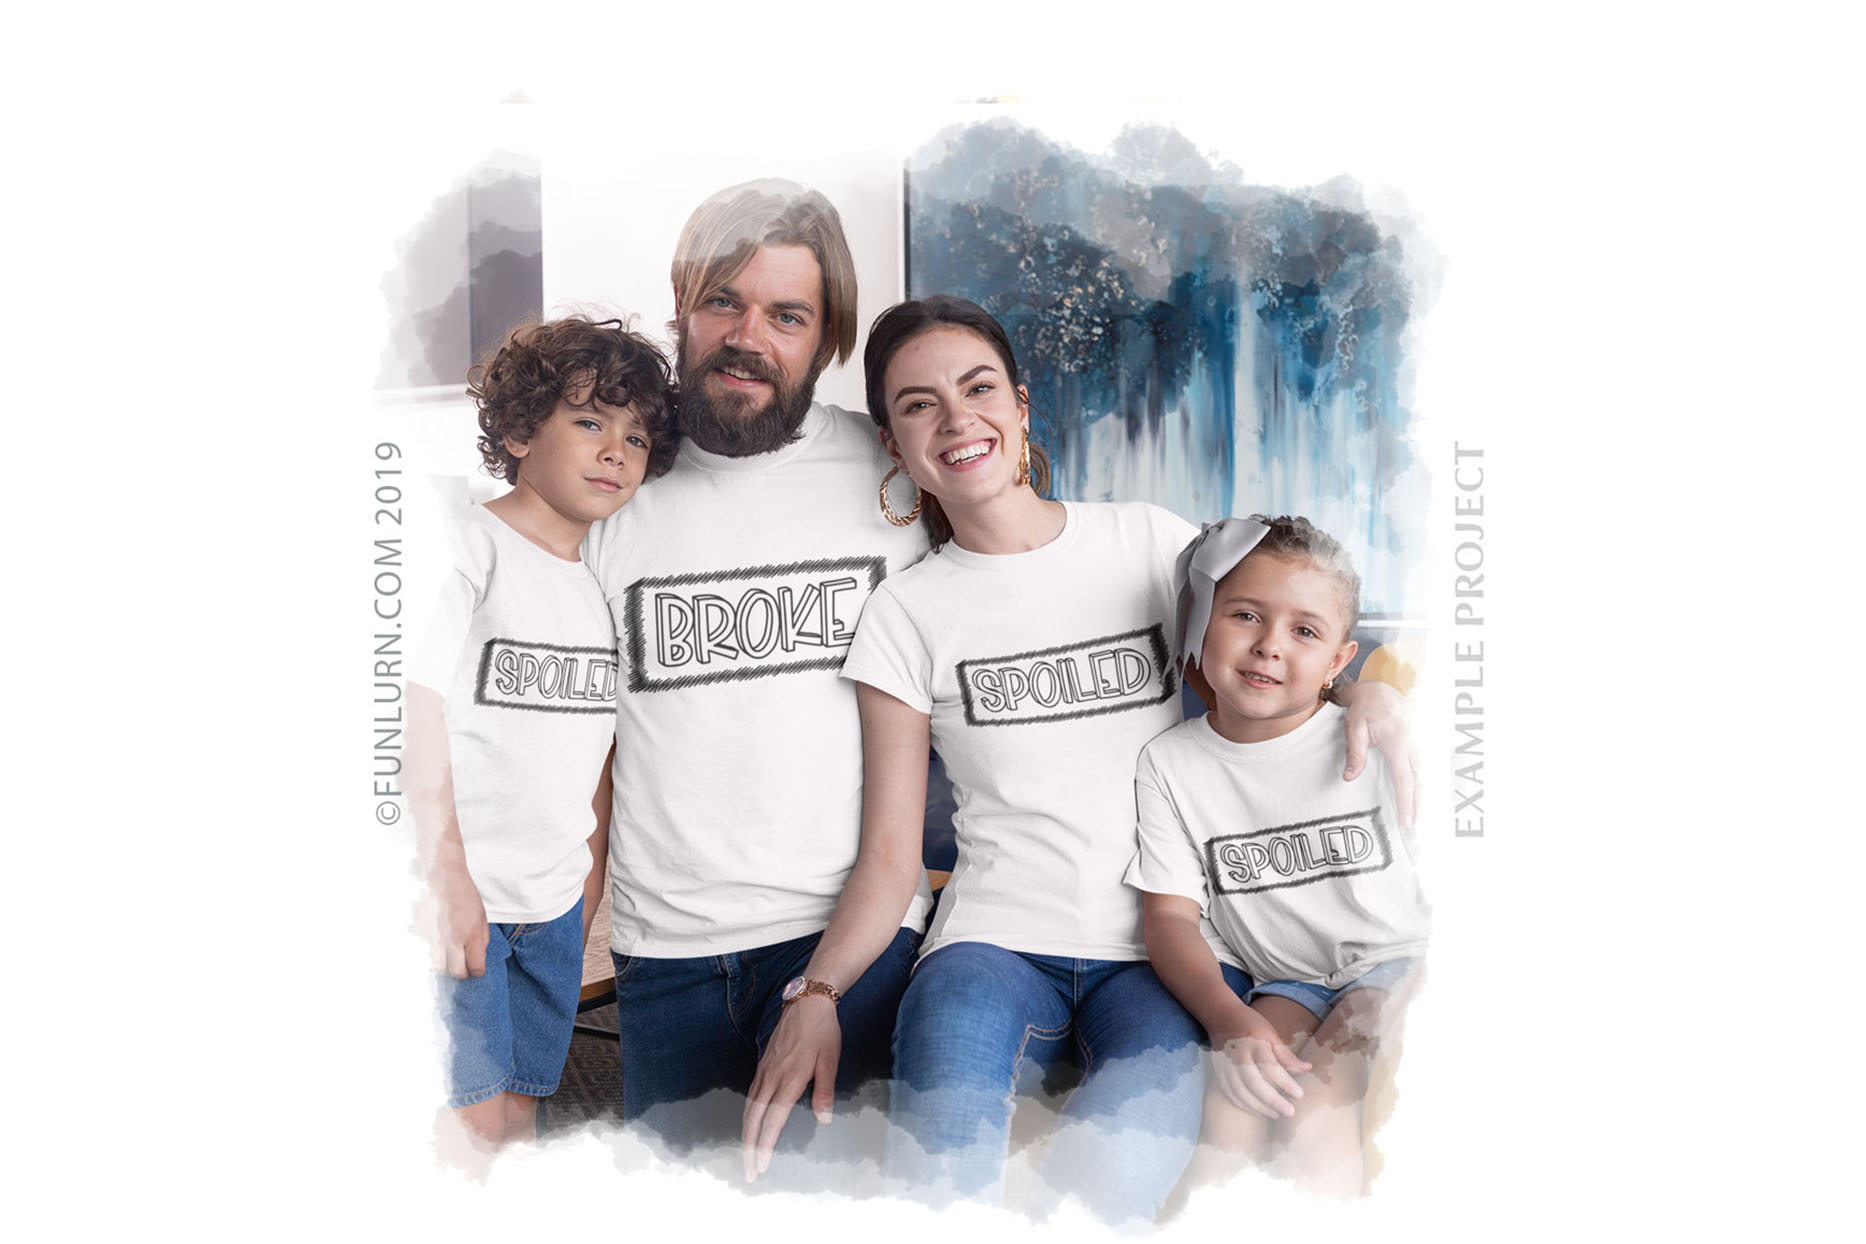 Broke Spoiled Family Set SVG Cut File example image 3